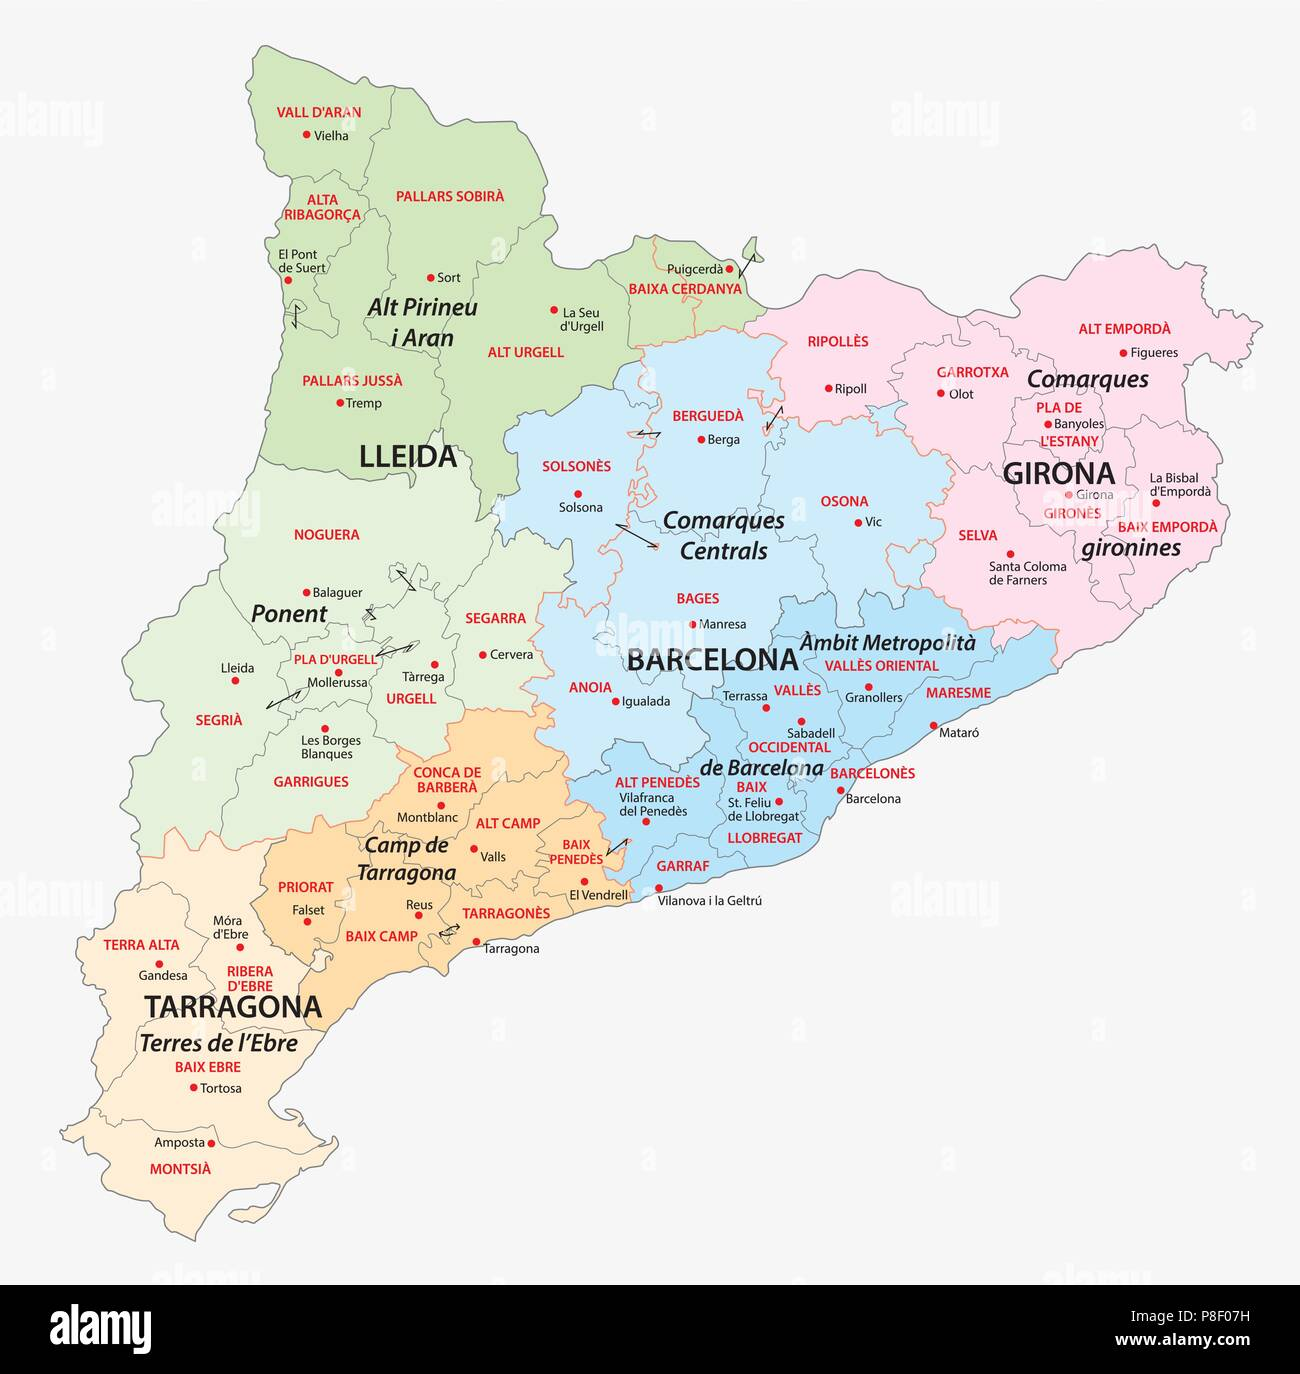 Cartina Catalogna.Catalogna Cartina Immagini E Fotos Stock Alamy